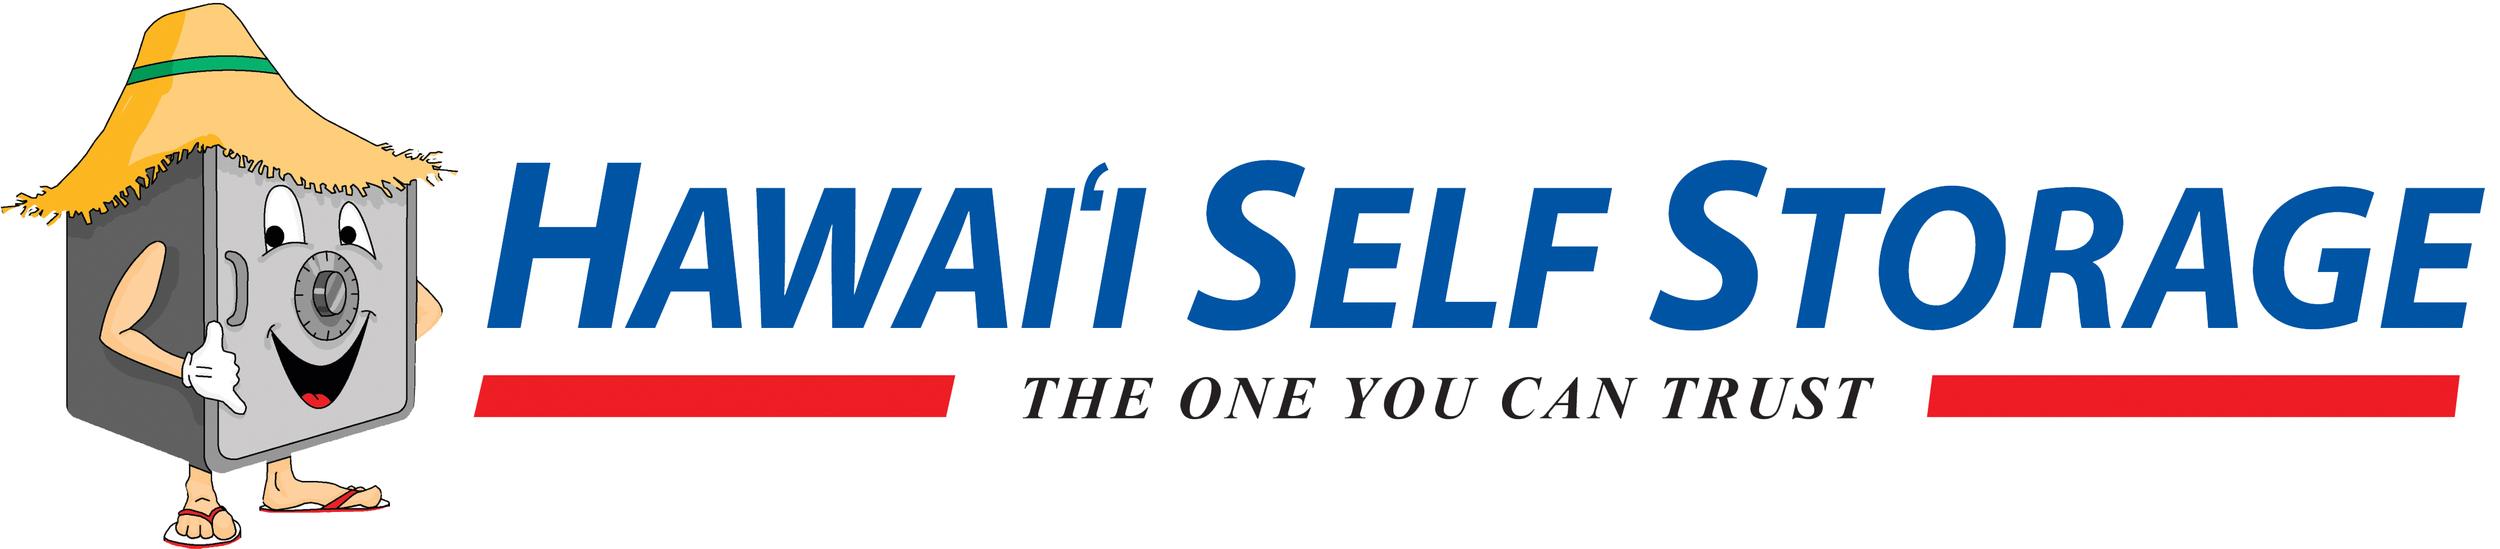 2011-hawaiiselfstorage-logo-copy.jpg